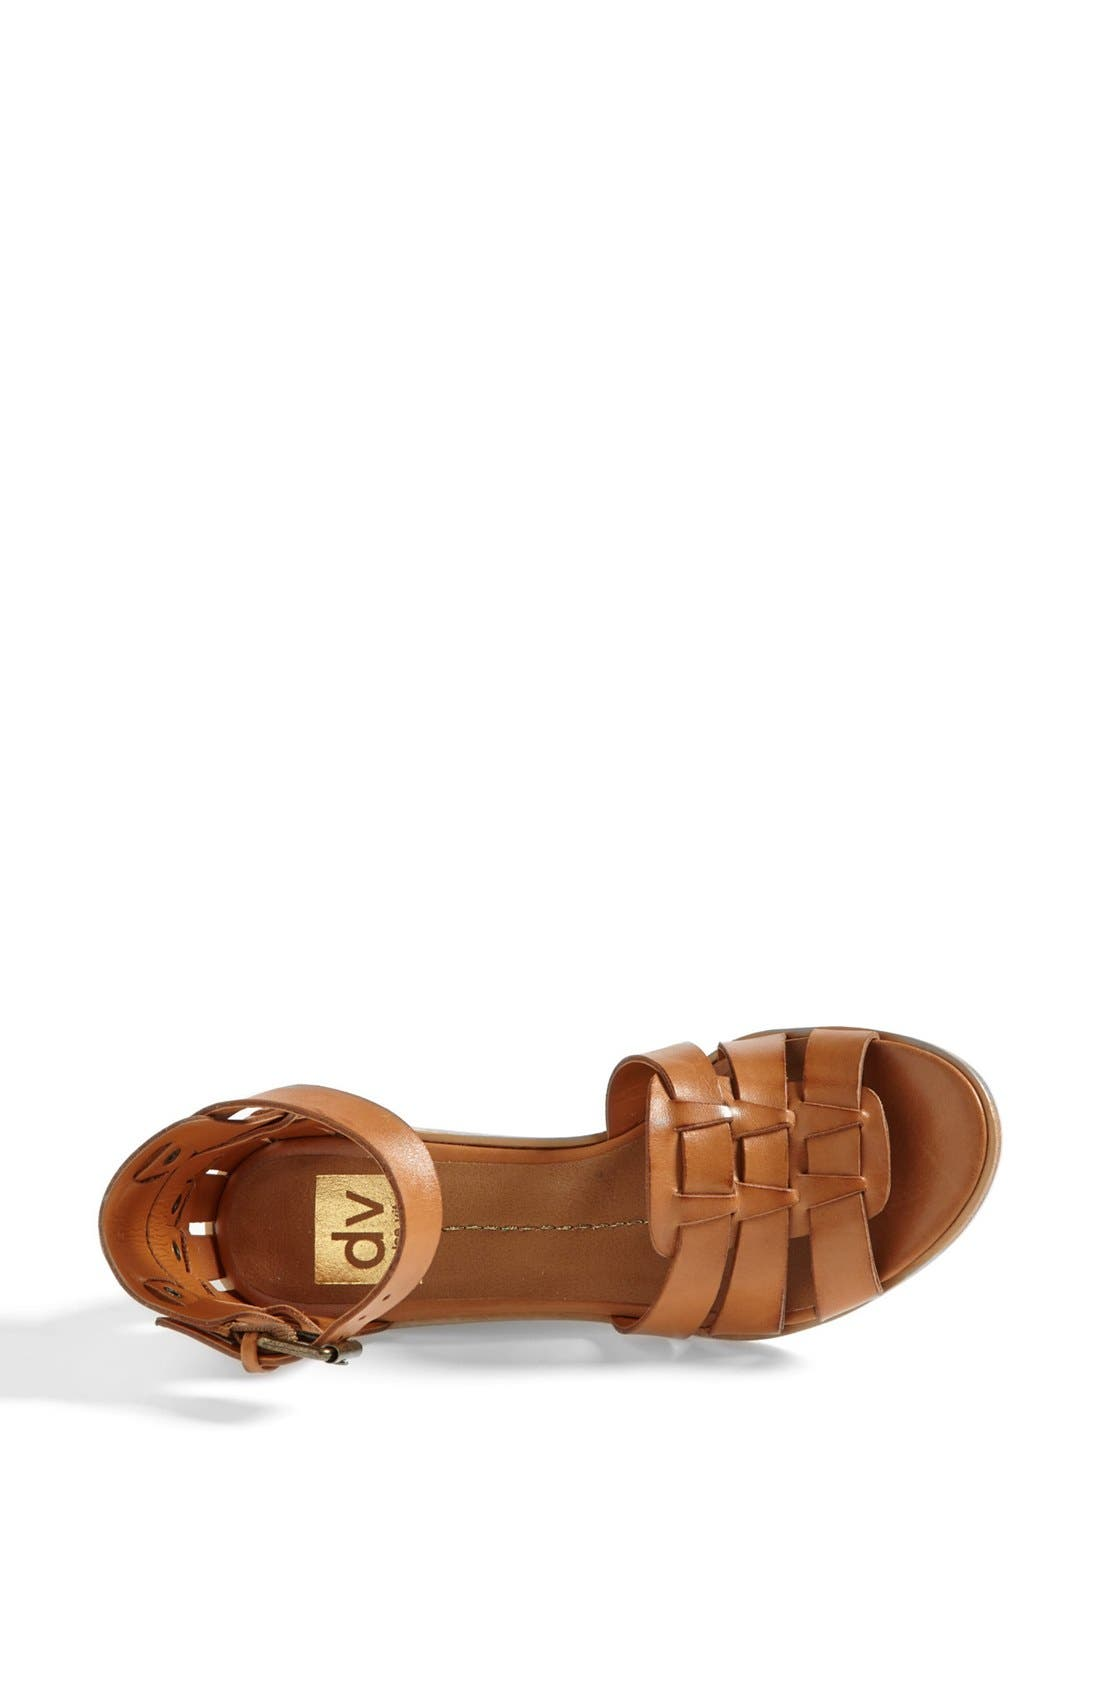 DV by Dolce Vita 'Cho' Wedge Sandal,                             Alternate thumbnail 3, color,                             Honey Leather